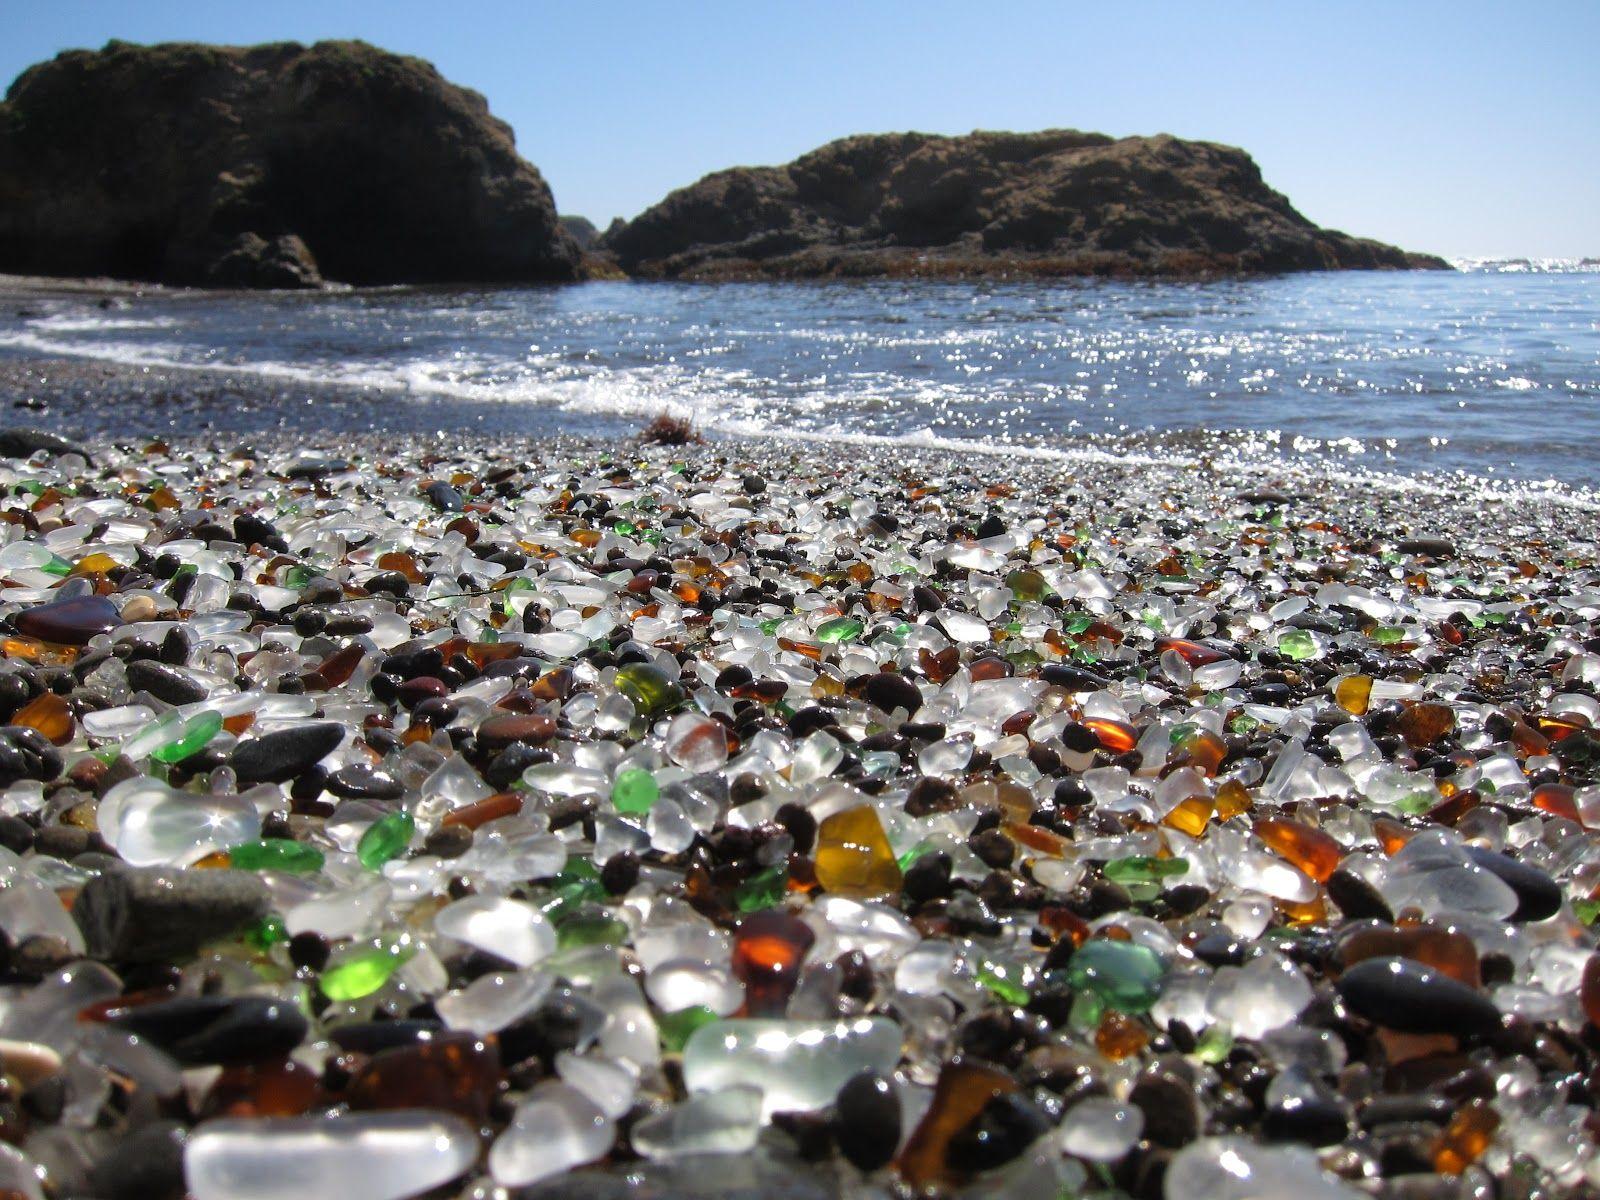 Sea Glass What Is Sea Glass Where Can I Find Sea Glass Sea